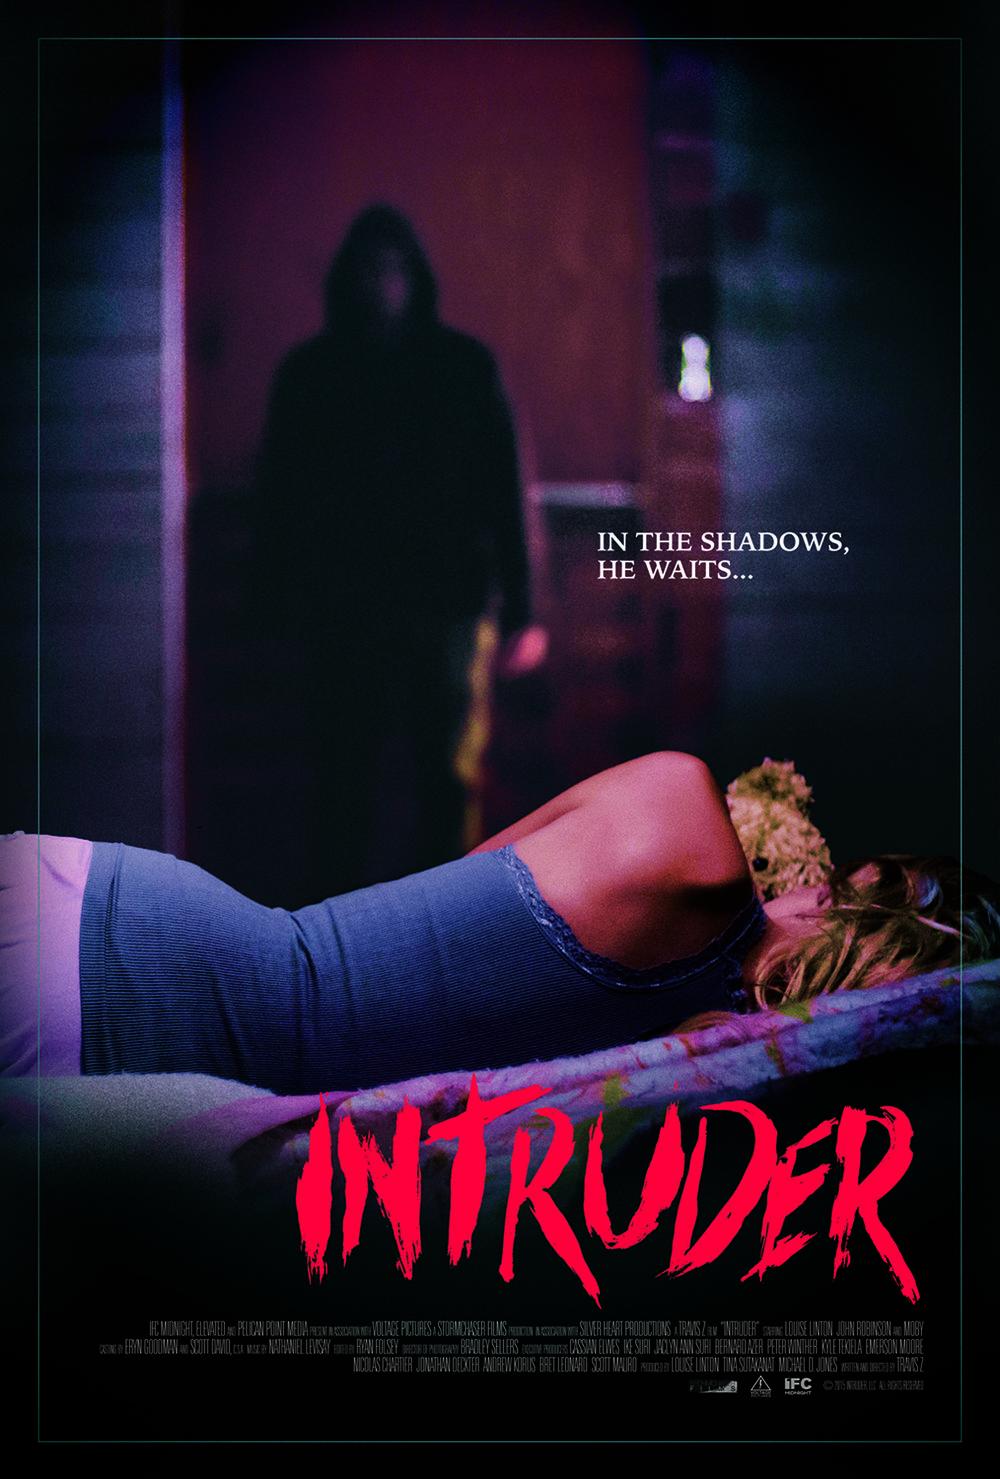 INTRUDER - Producer